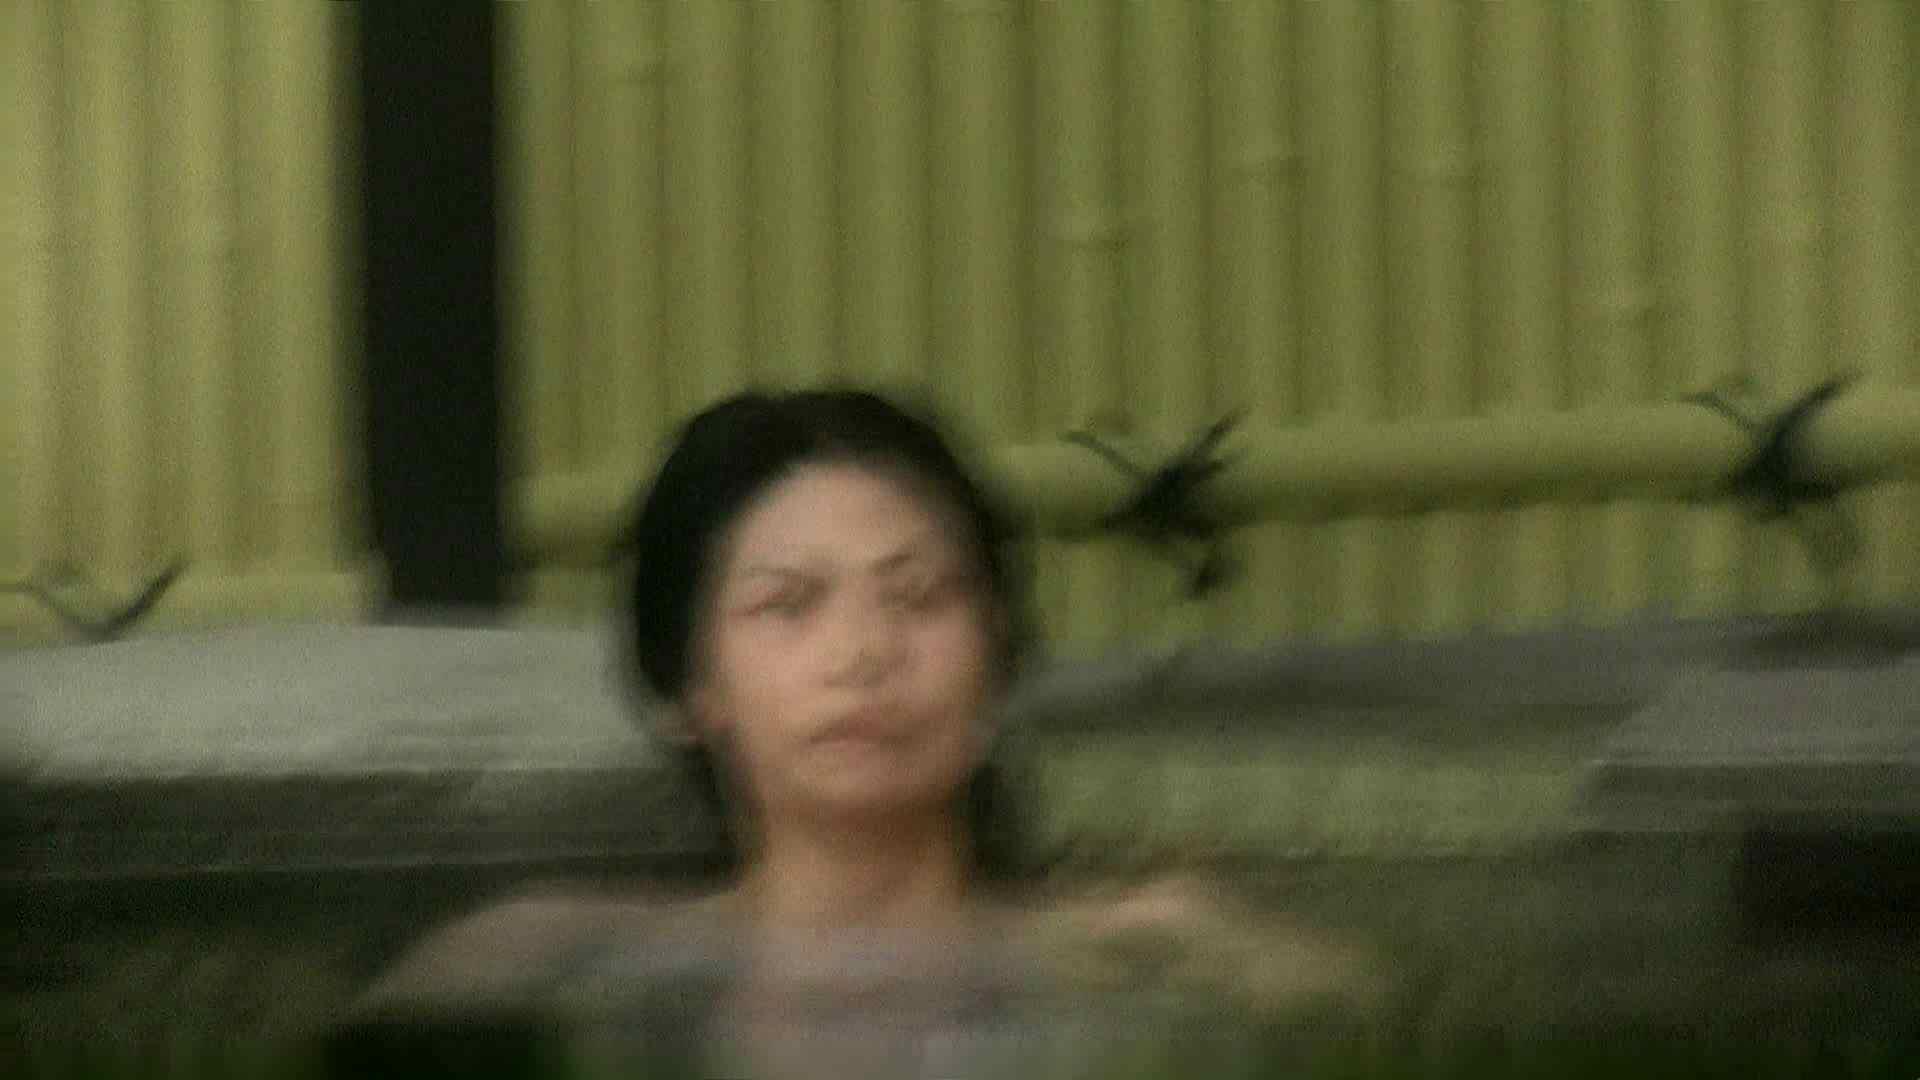 Aquaな露天風呂Vol.636 HなOL | 盗撮  82pic 27